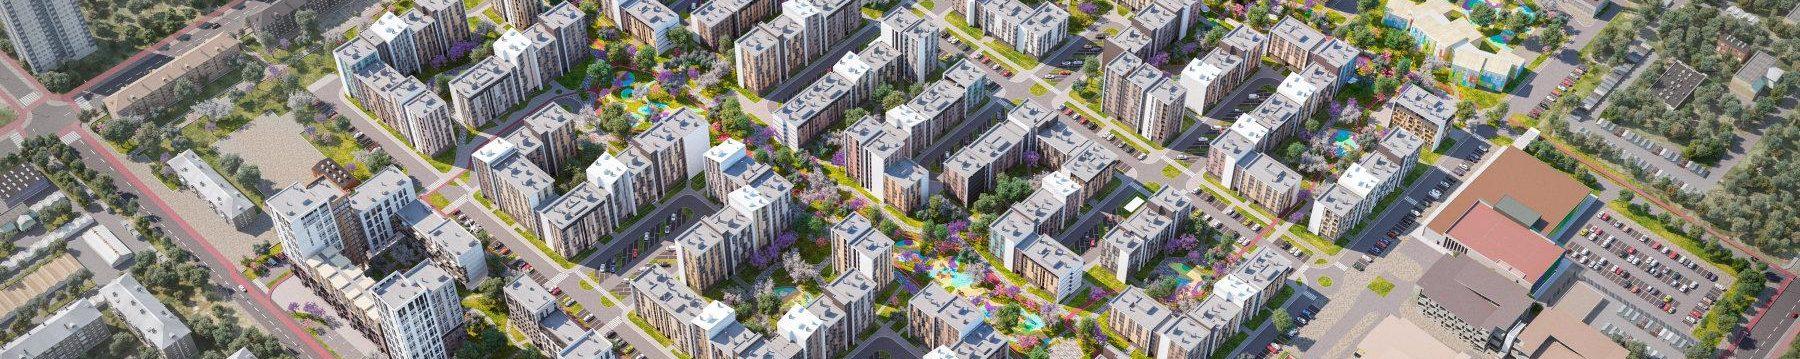 Файна Таун: квартиры, планировки, цены, отзывы